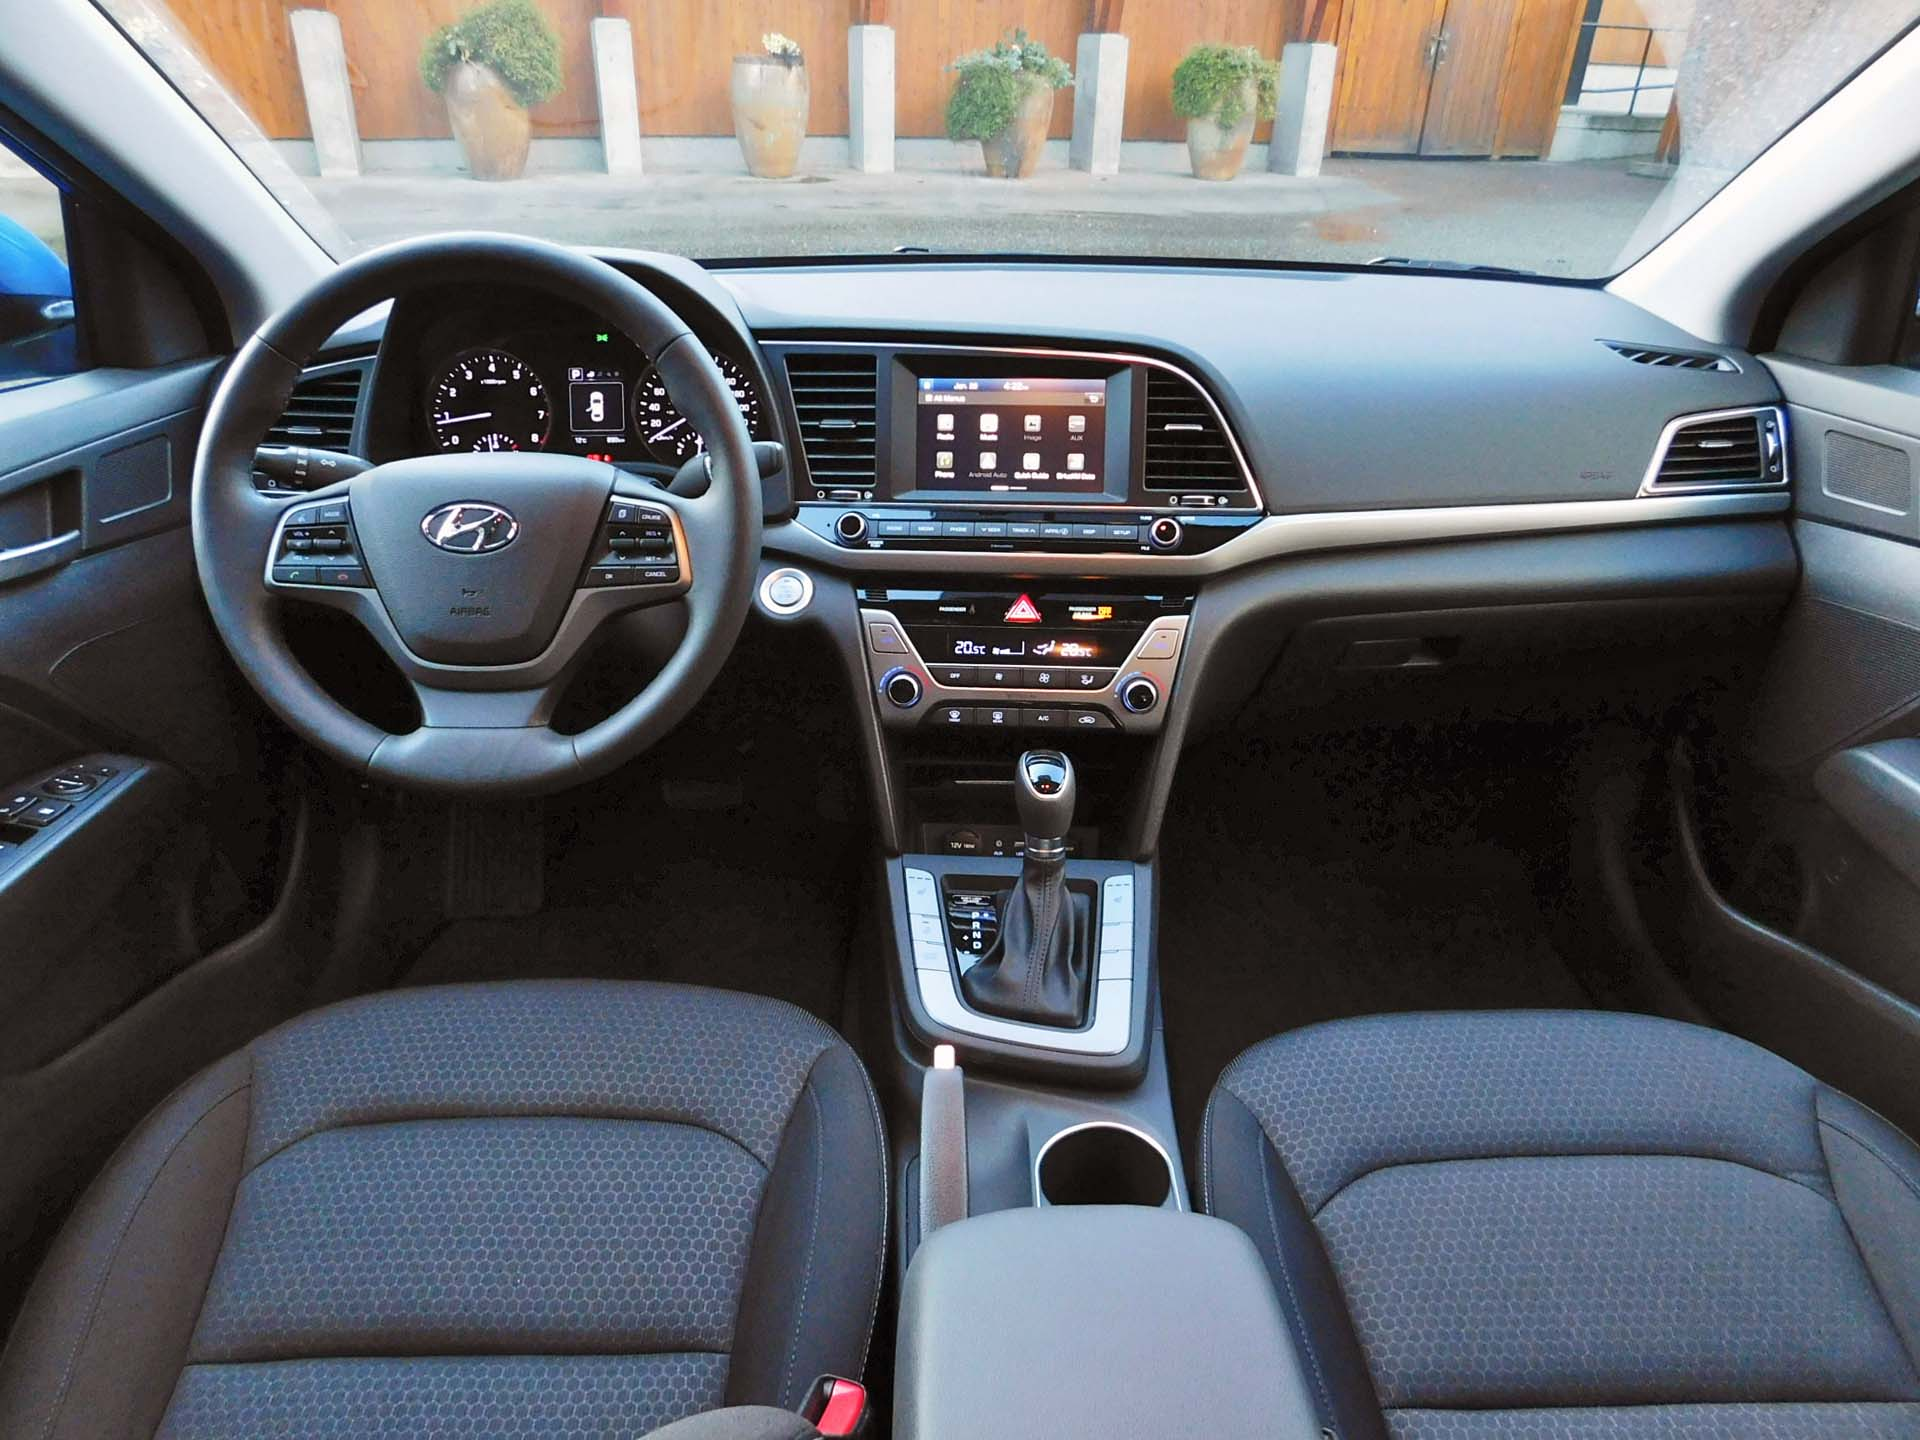 Hyundai Elantra Gls Sh on 2008 Hyundai Elantra Gls